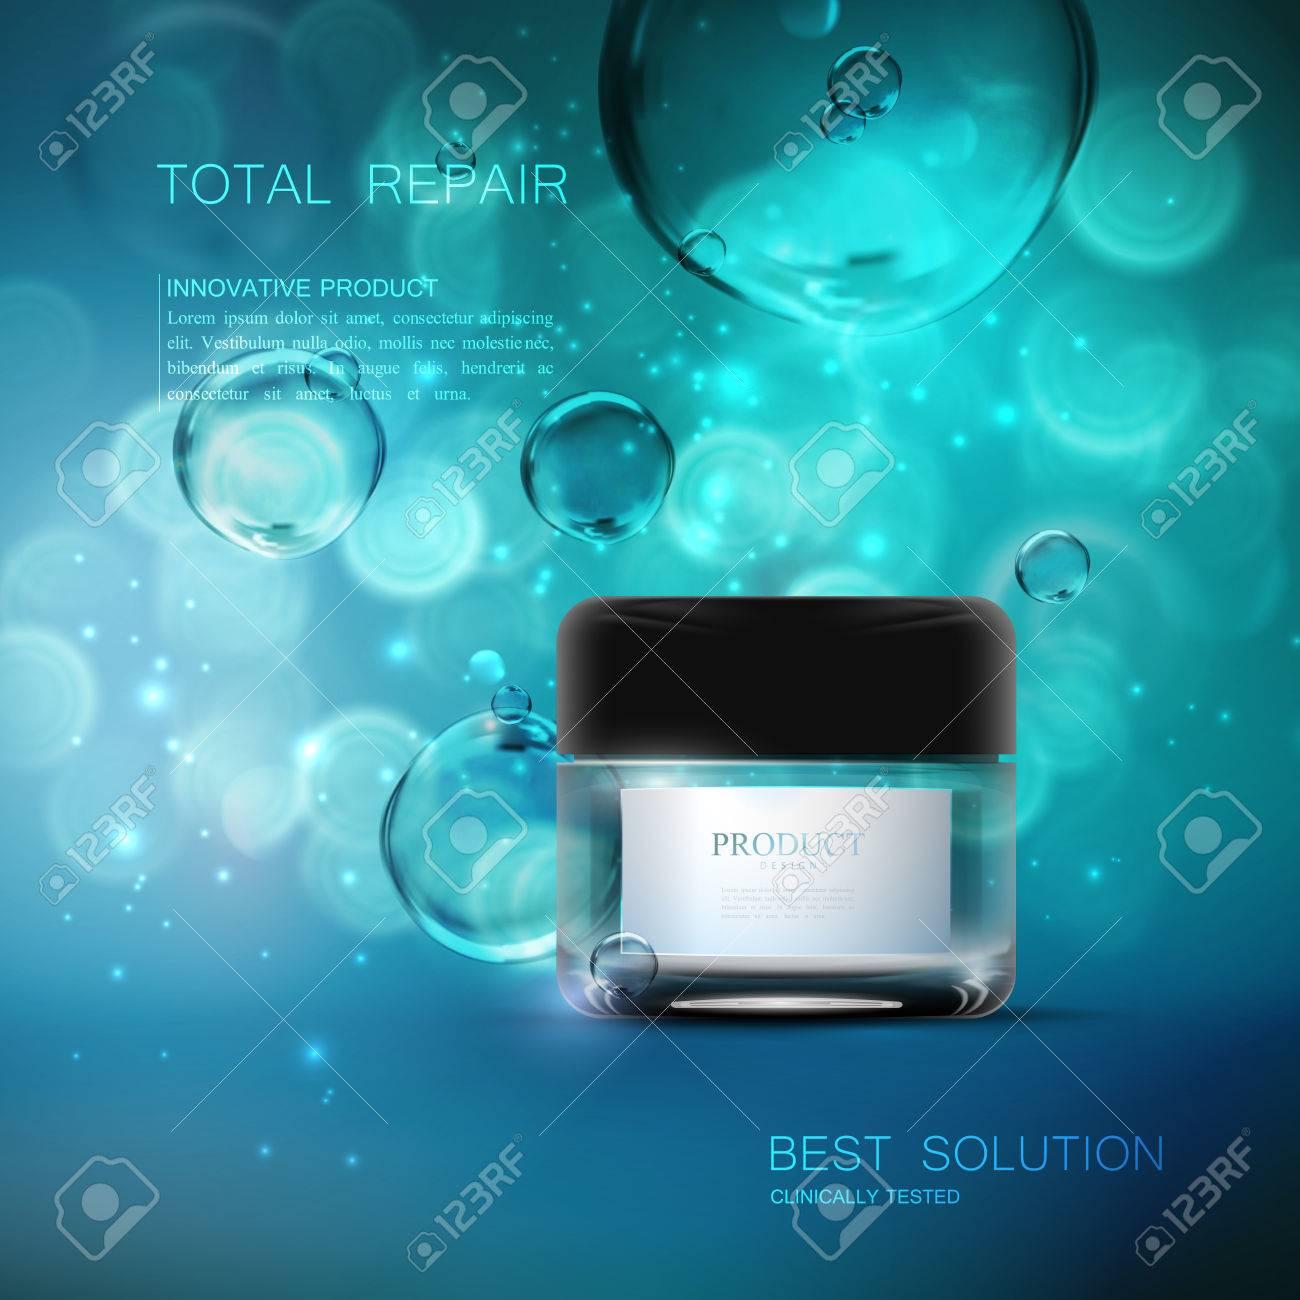 Beauty anti aging cream ads. - 74883943